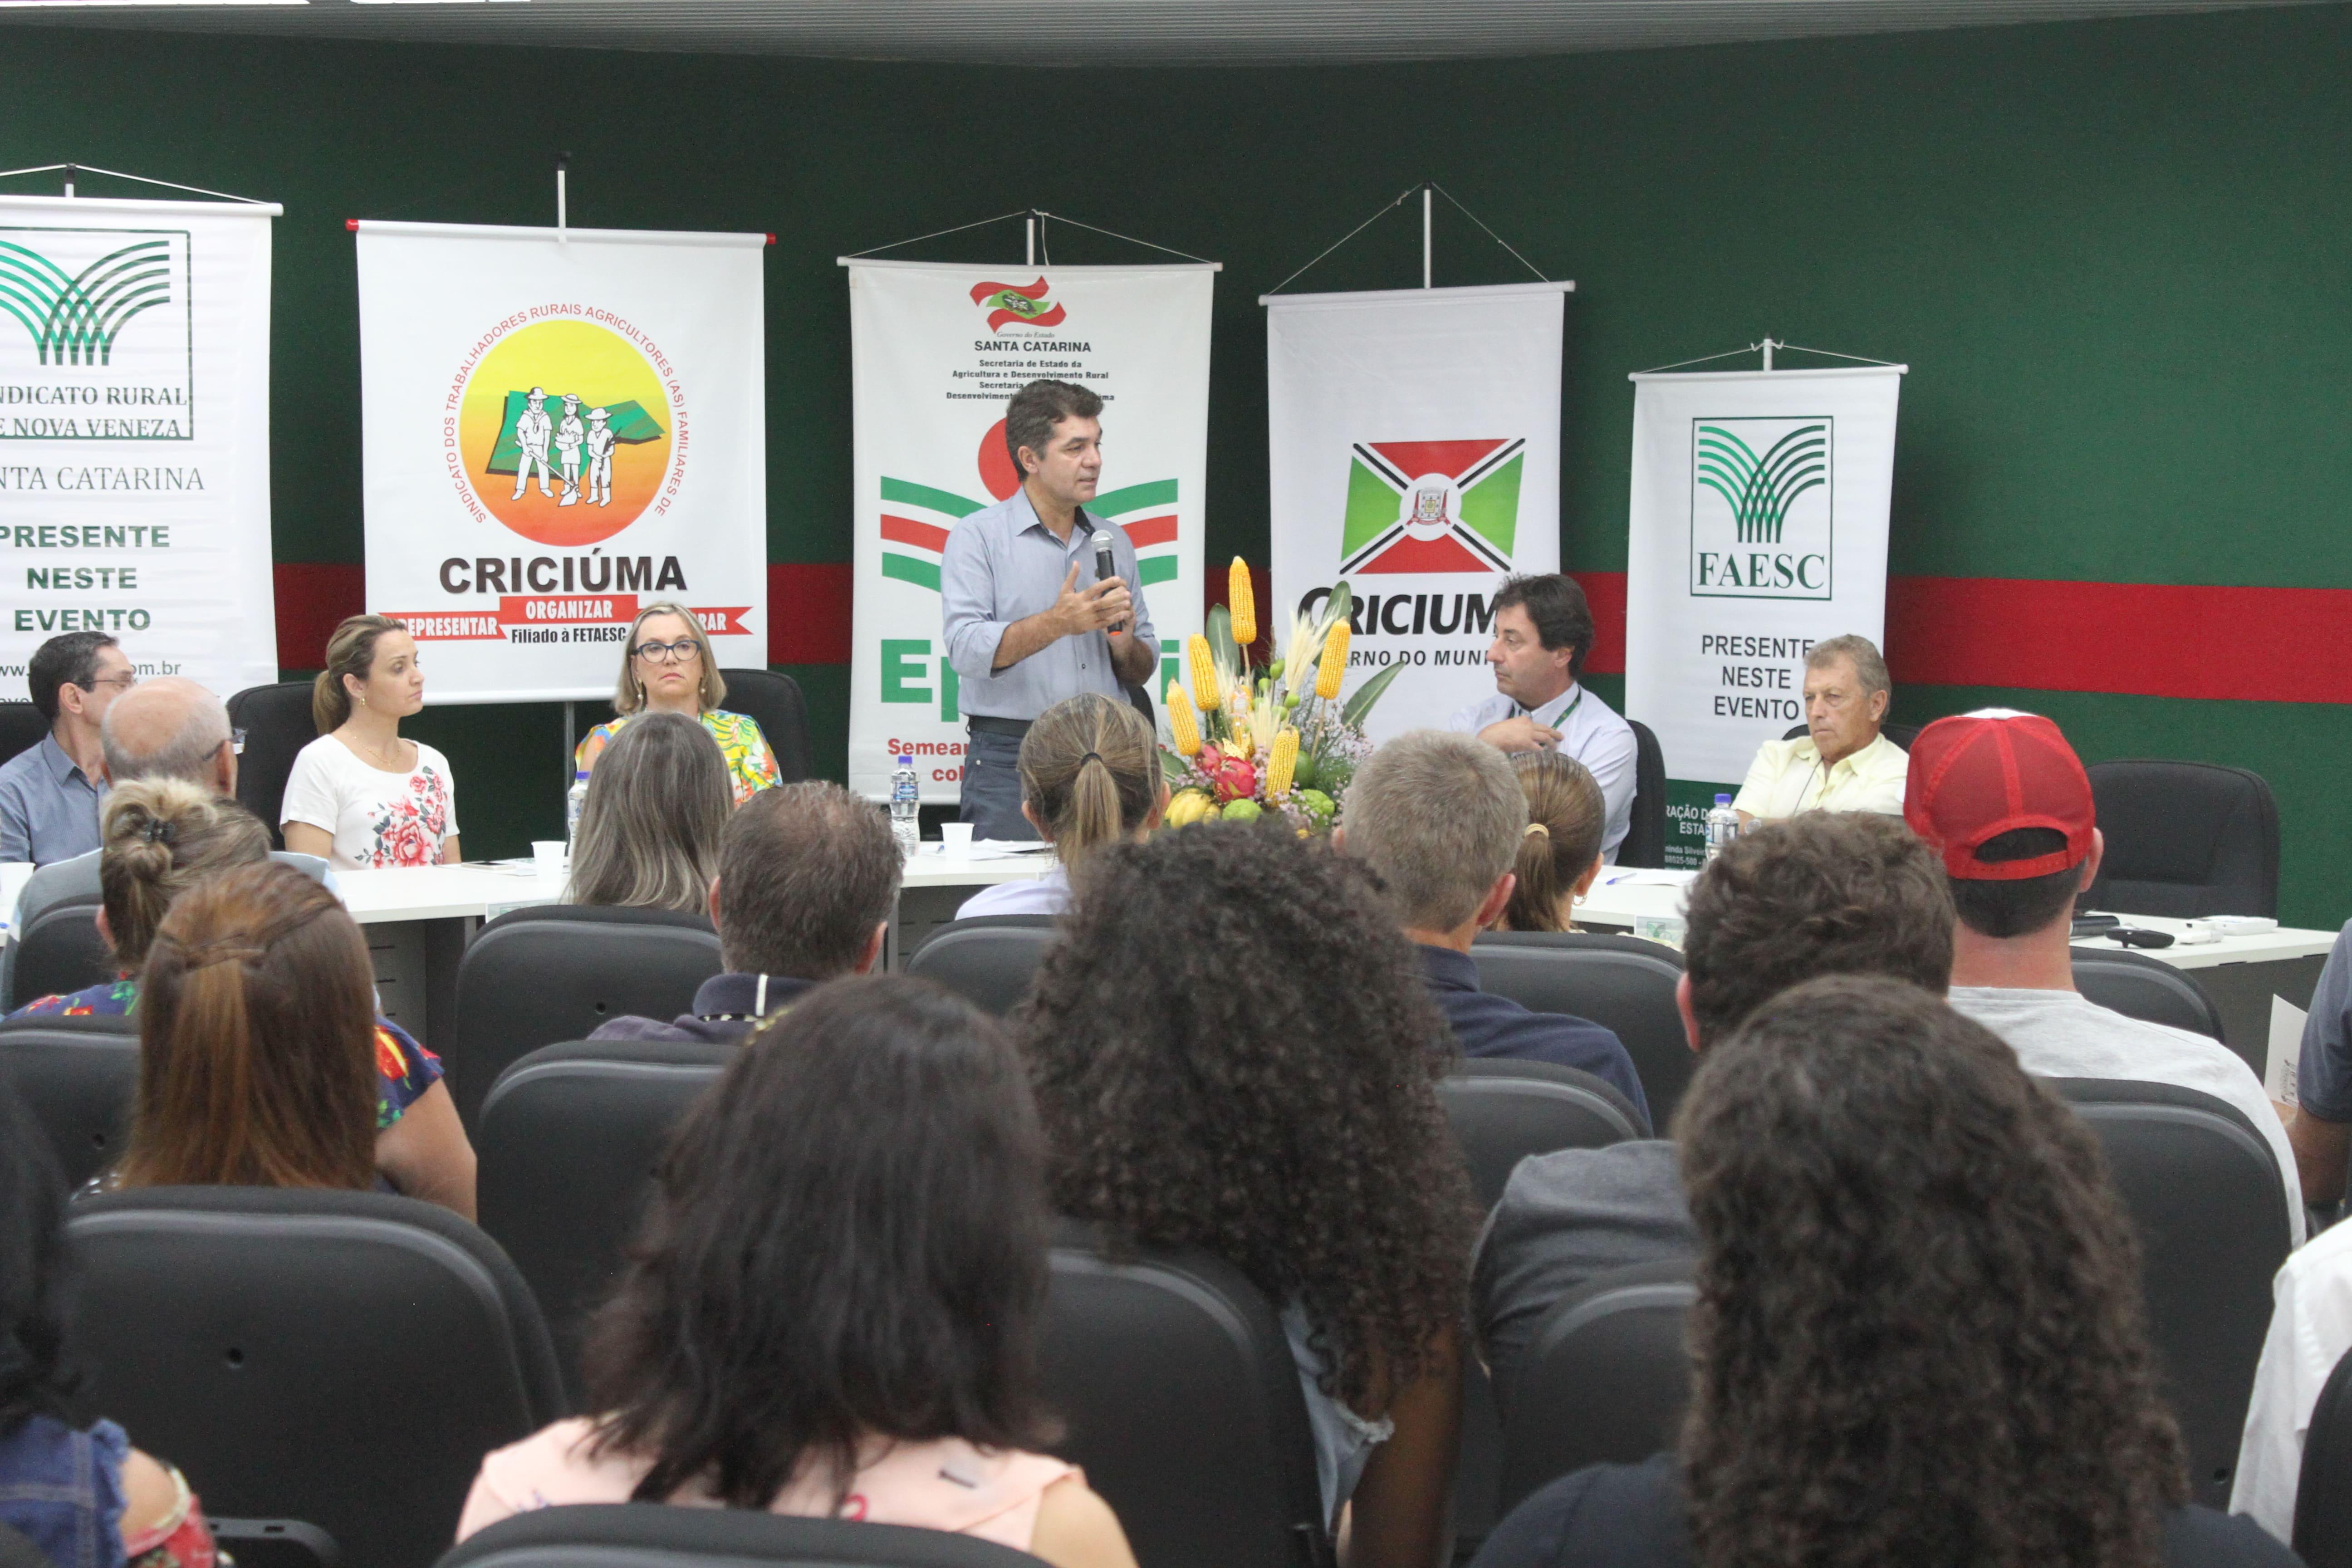 Prefeitura Municipal de Criciúma - Gerência de Agricultura promove seminário para produtores rurais de Criciúma